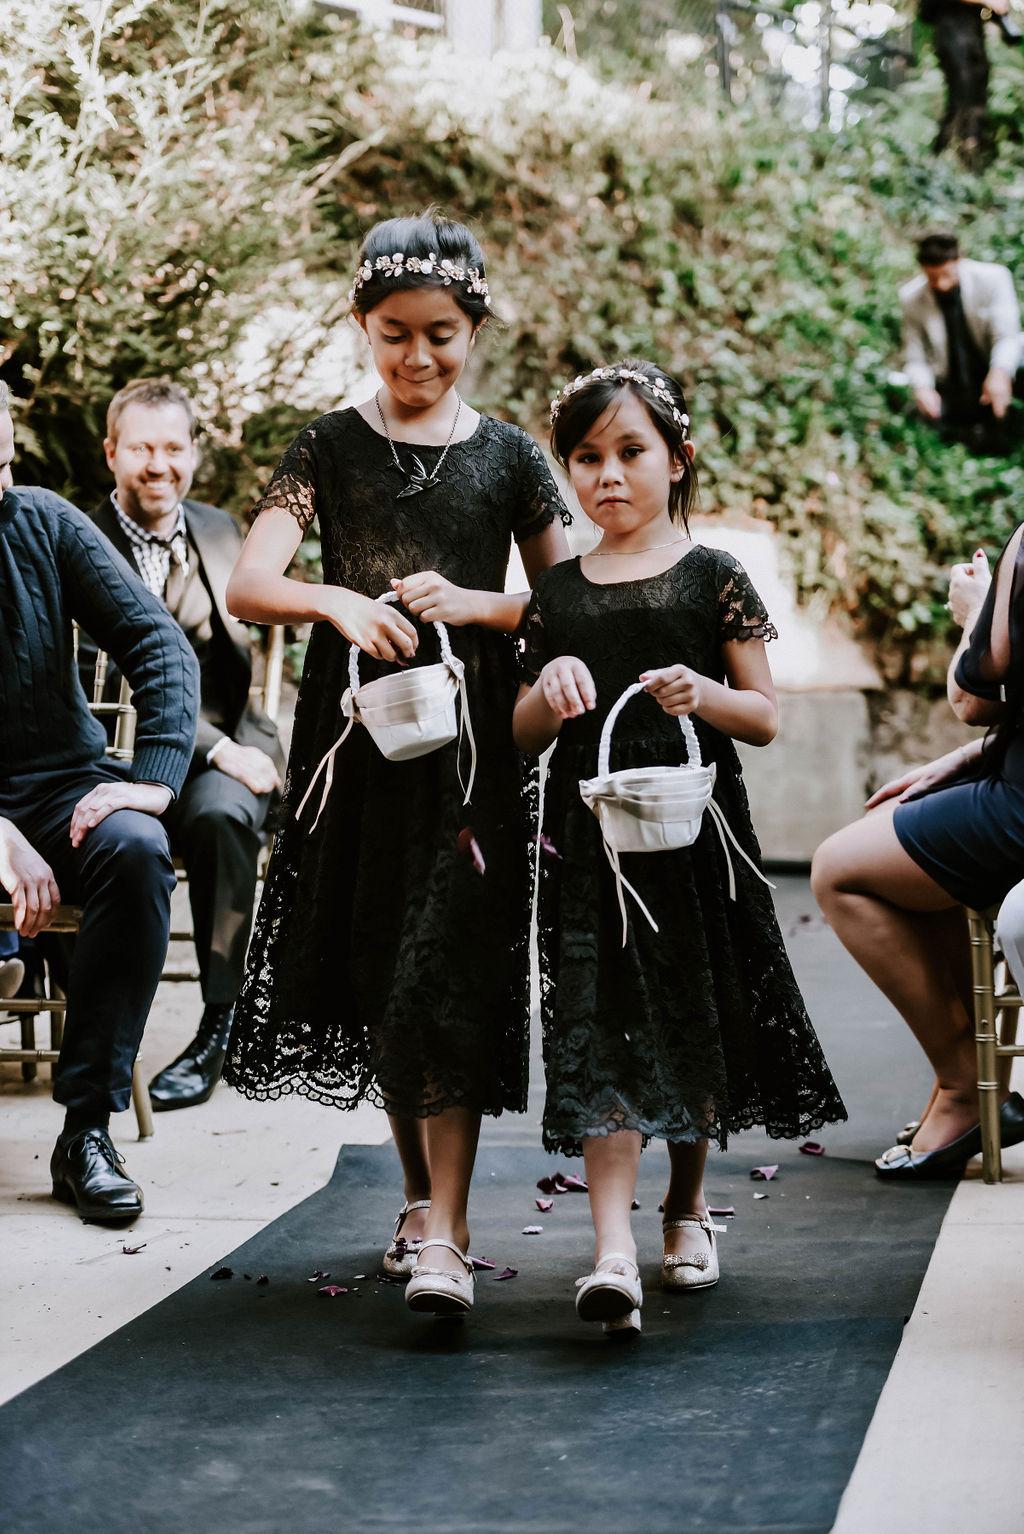 The flower girls were wearing black lace dresses